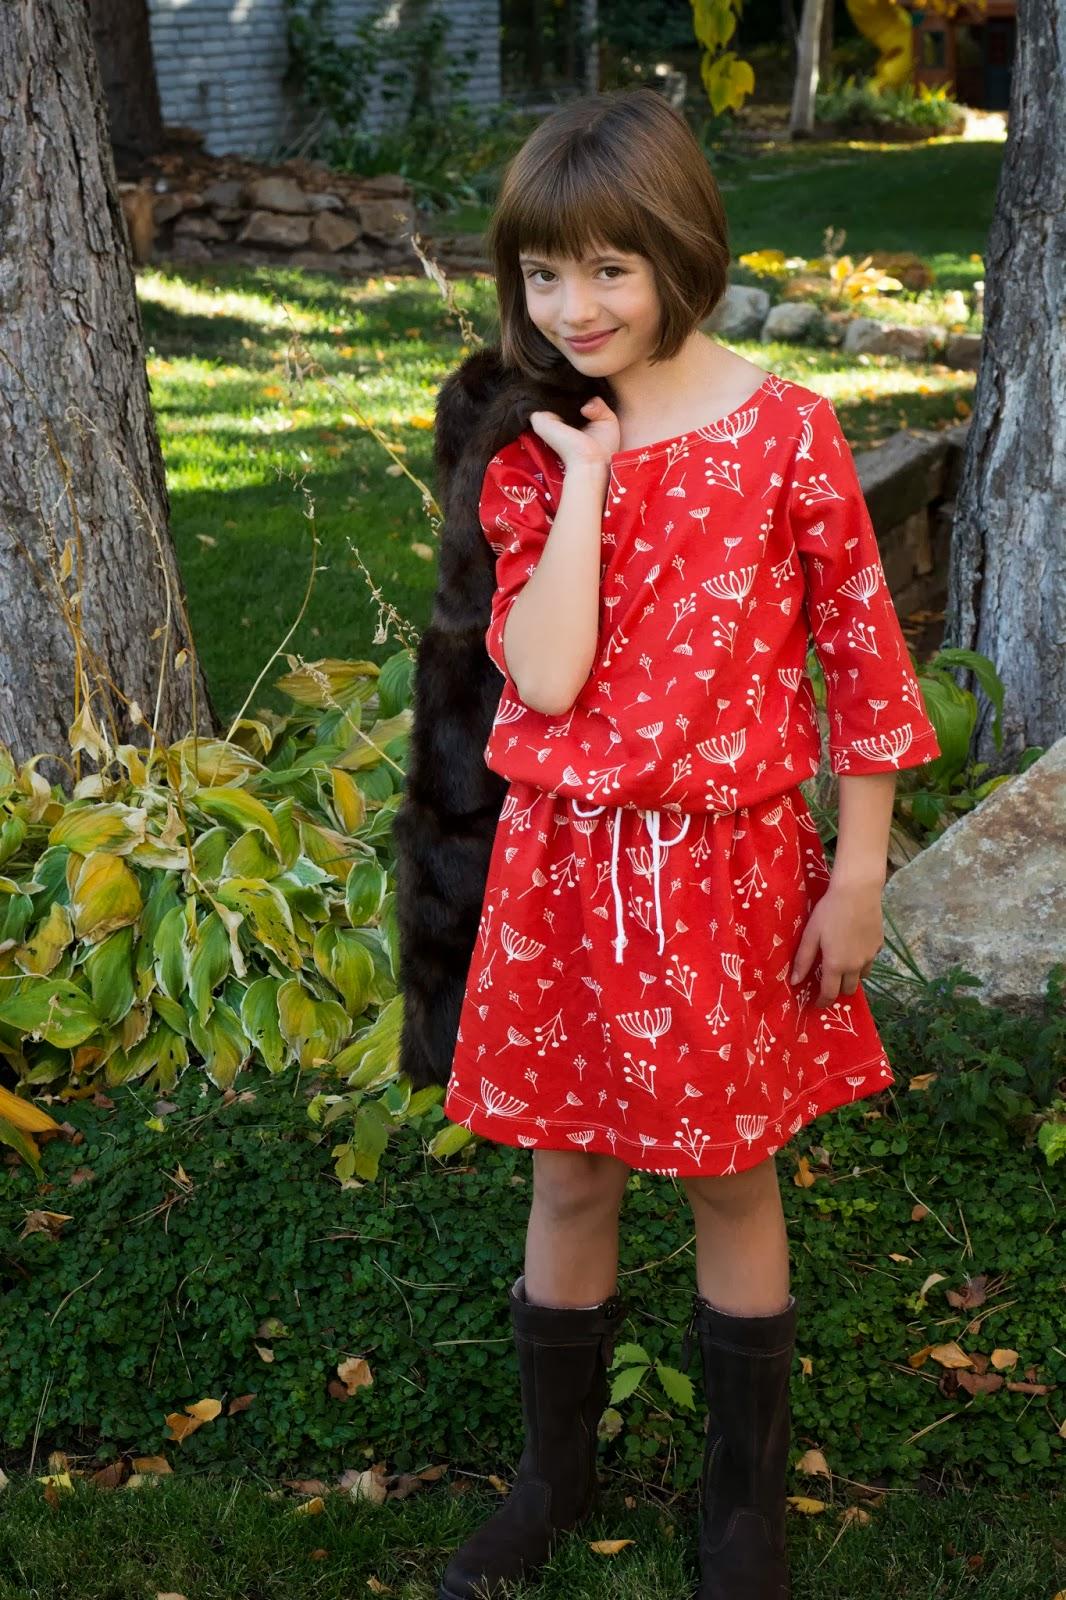 Aesthetic Nest Giveaway Charley Harper Bateau Neck Dress Kit